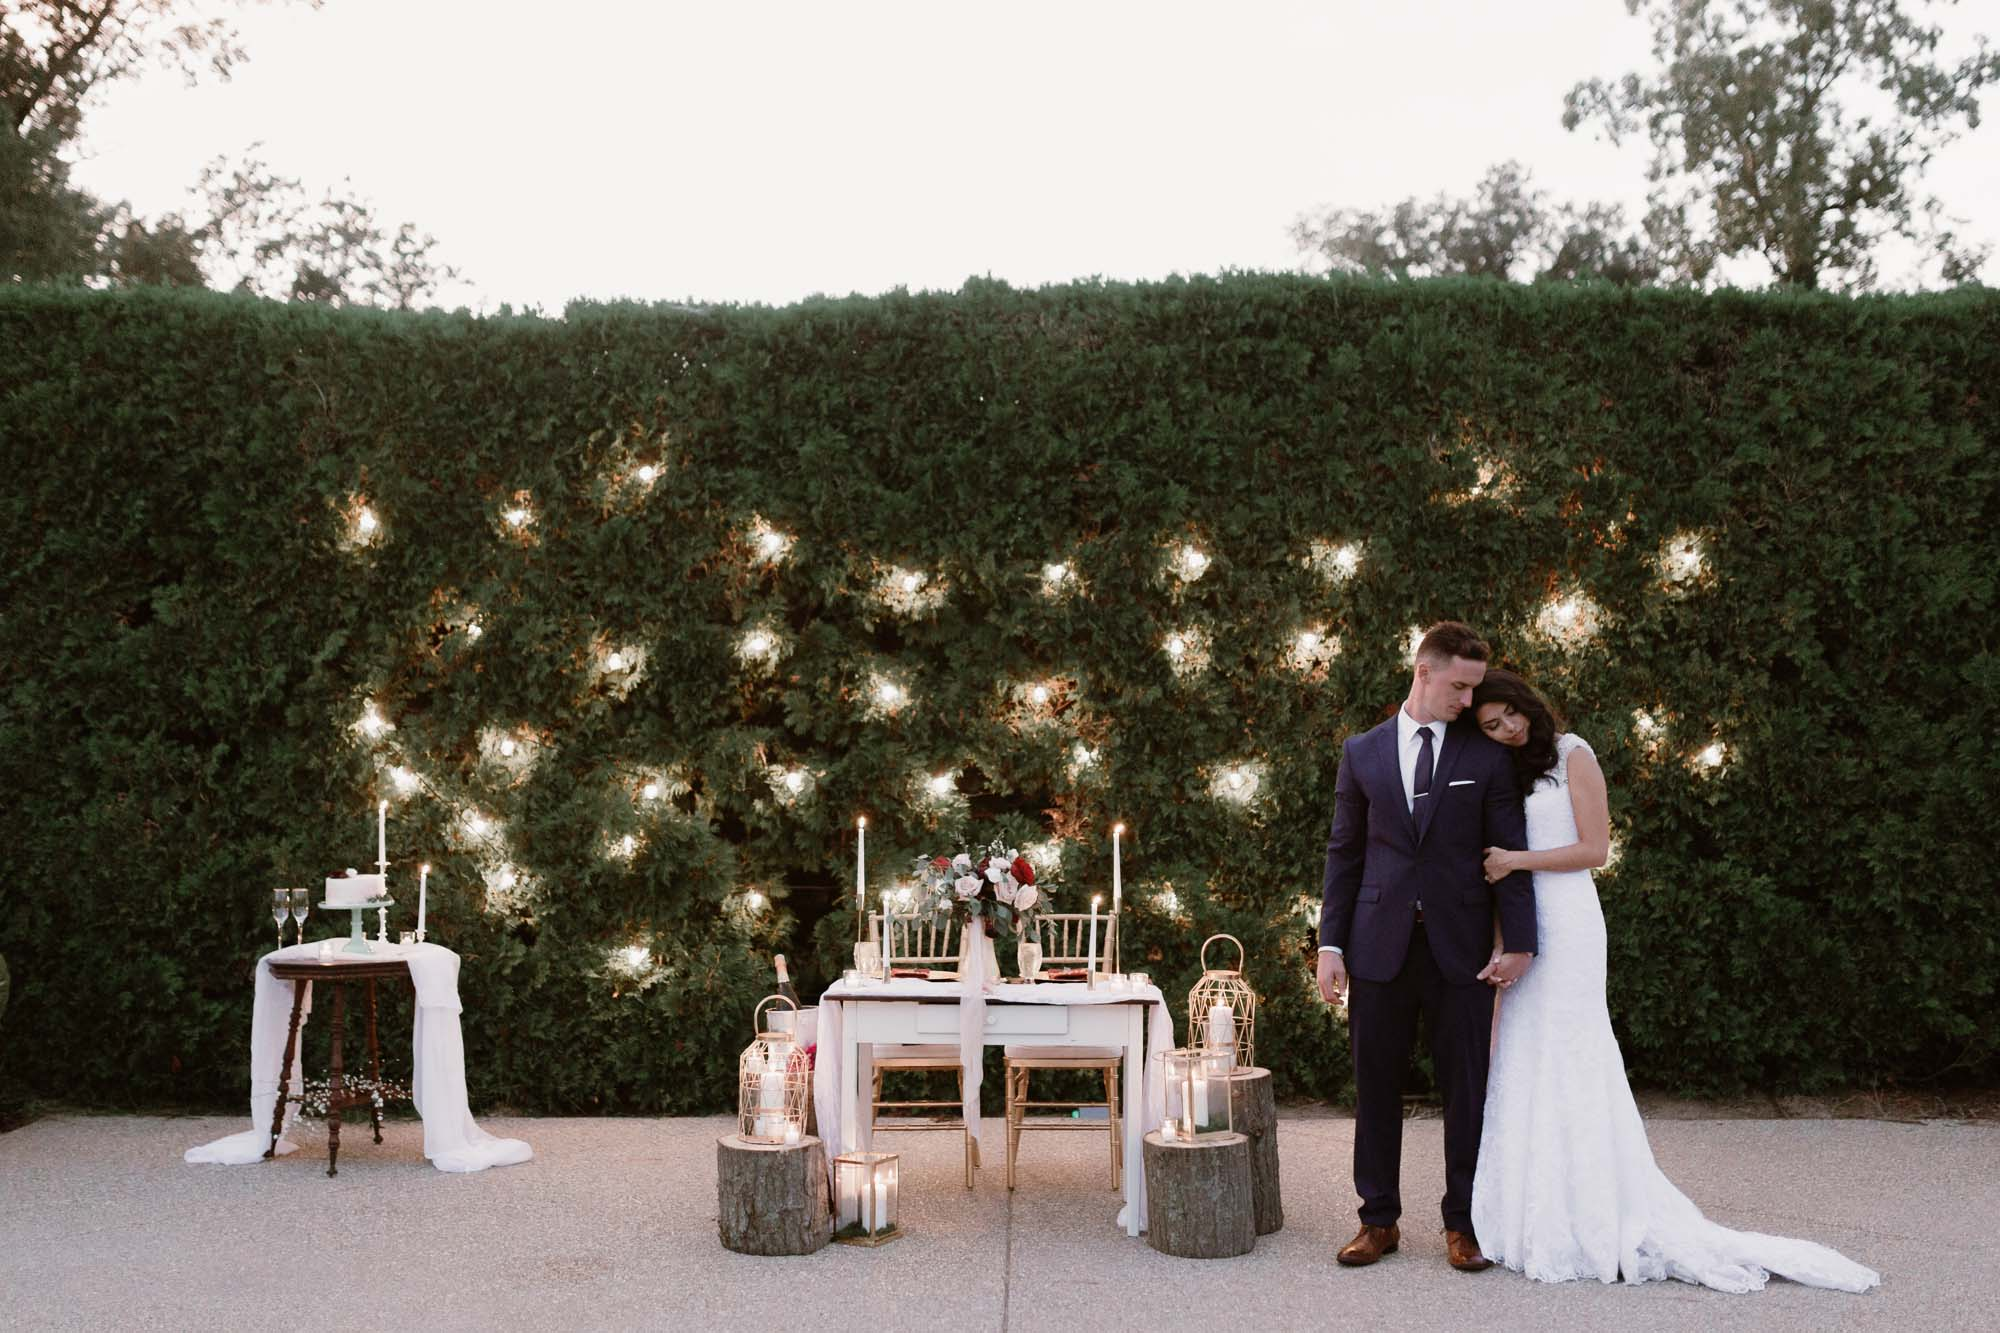 champaign_il_wedding_photography-0941.jpg